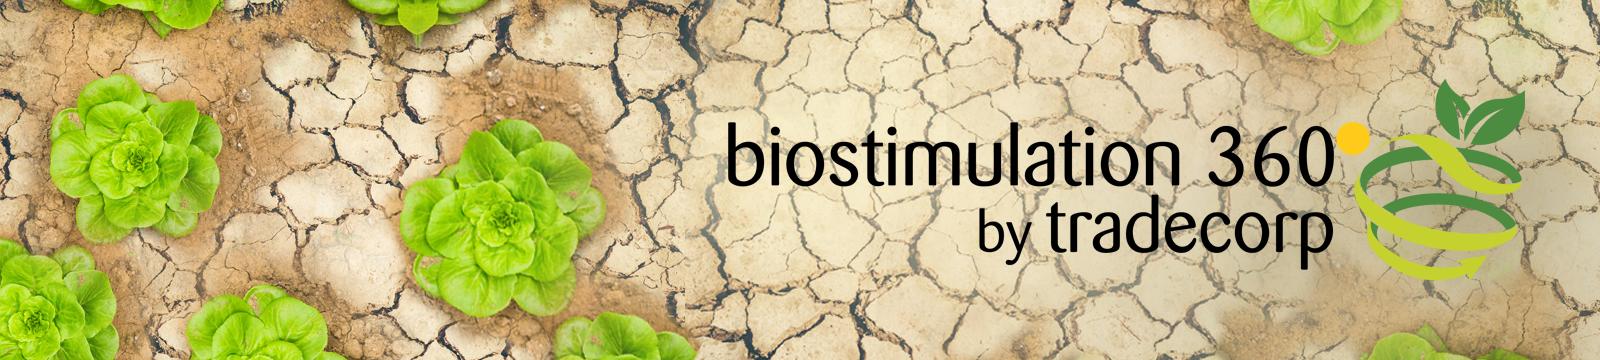 Tradecorp presents Biostimulation 360º